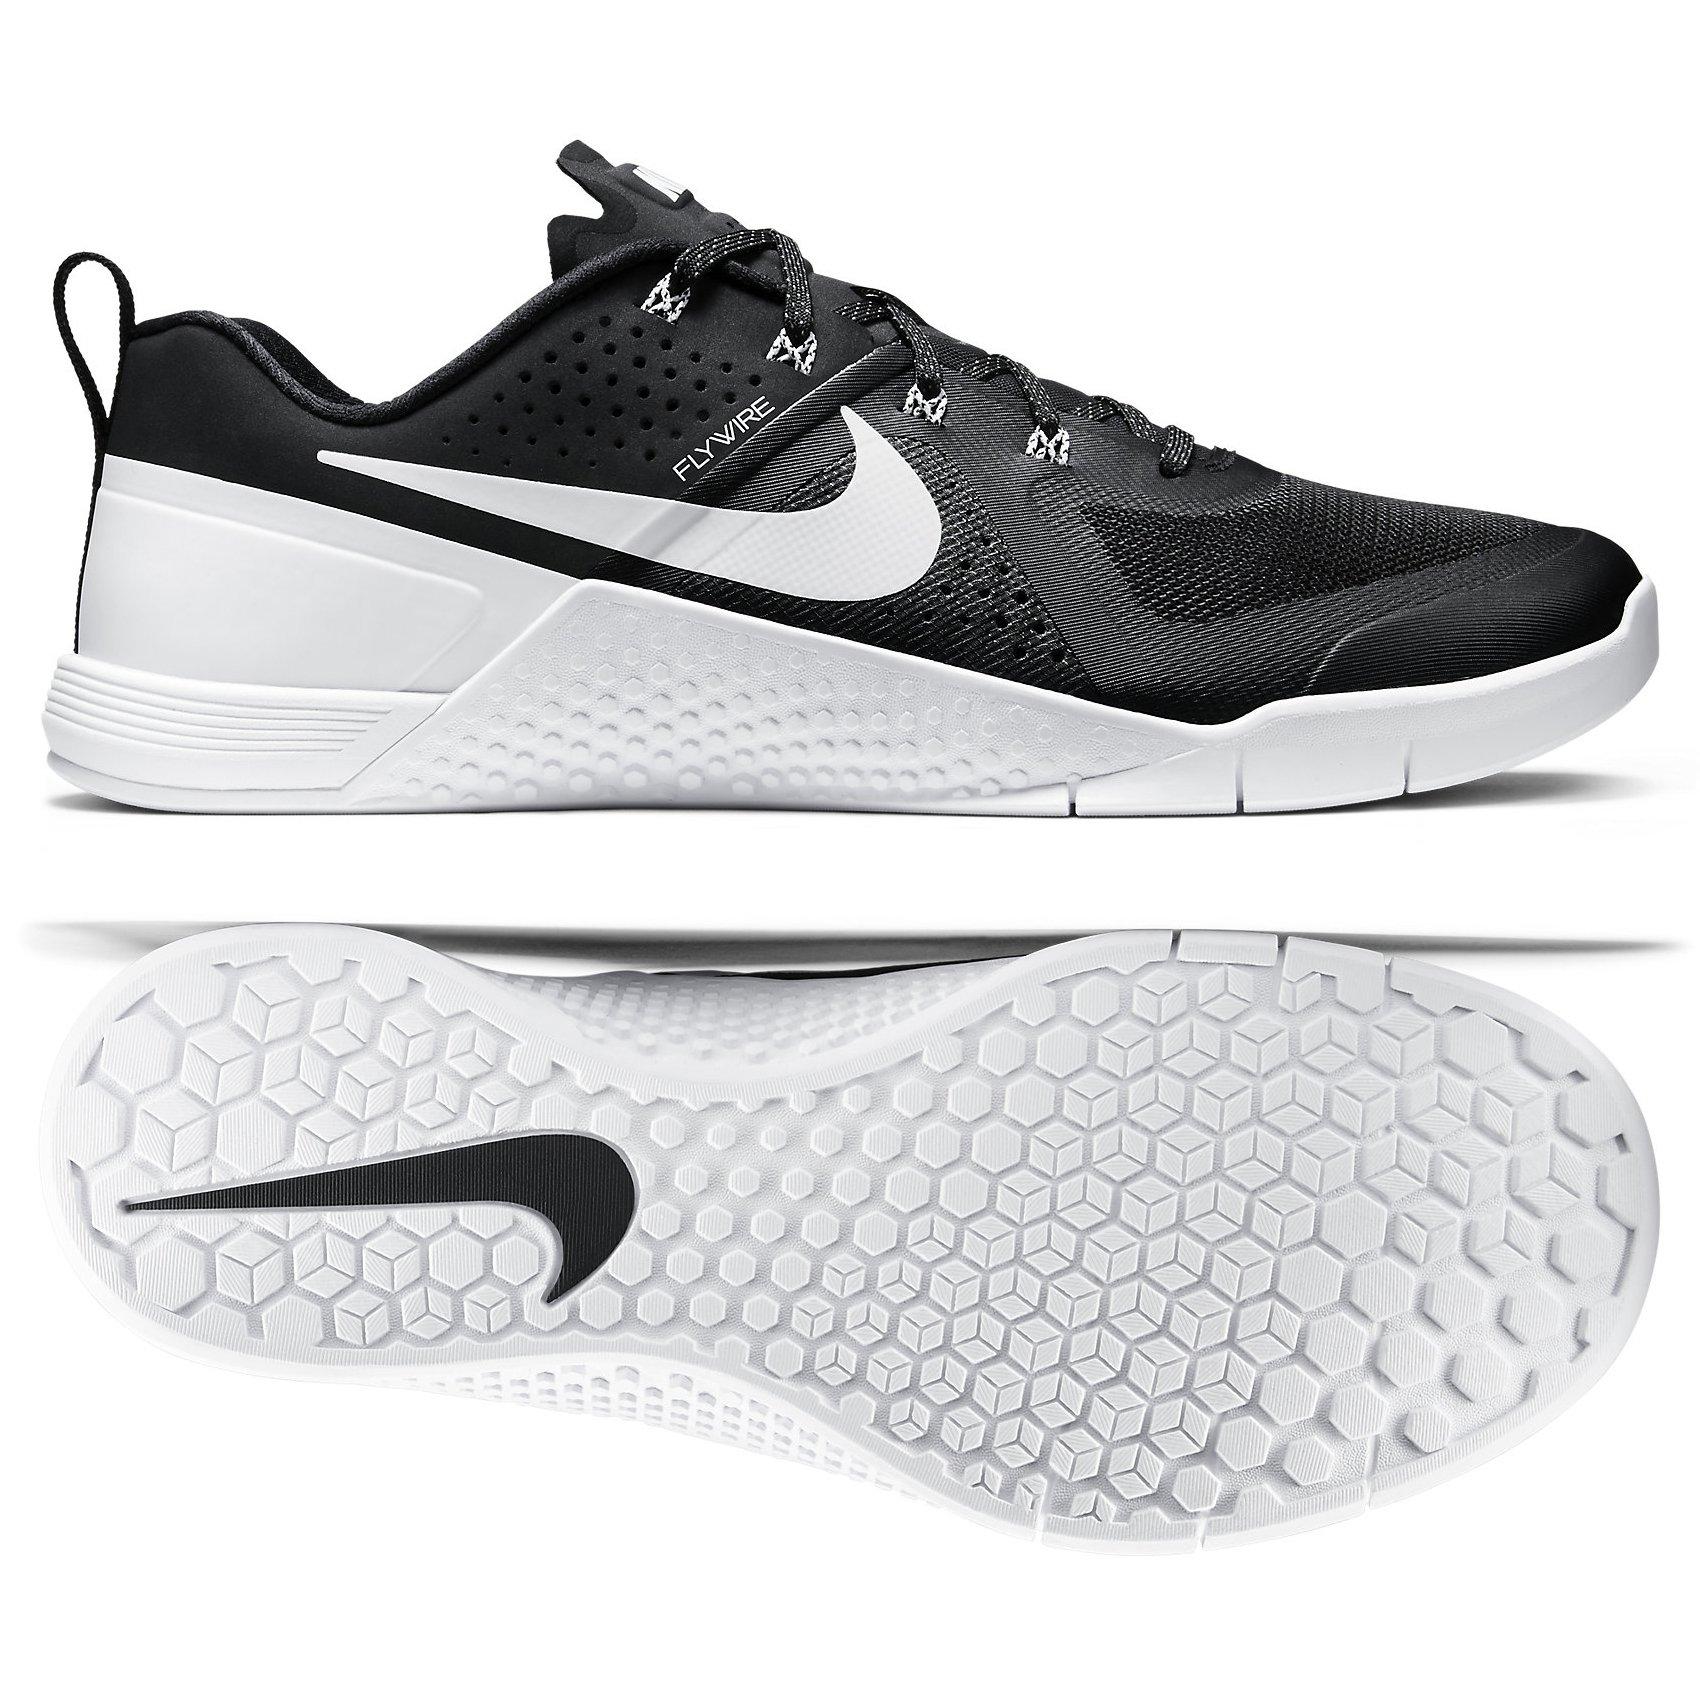 Nike Metcon 1 Amp PX Mens Cross